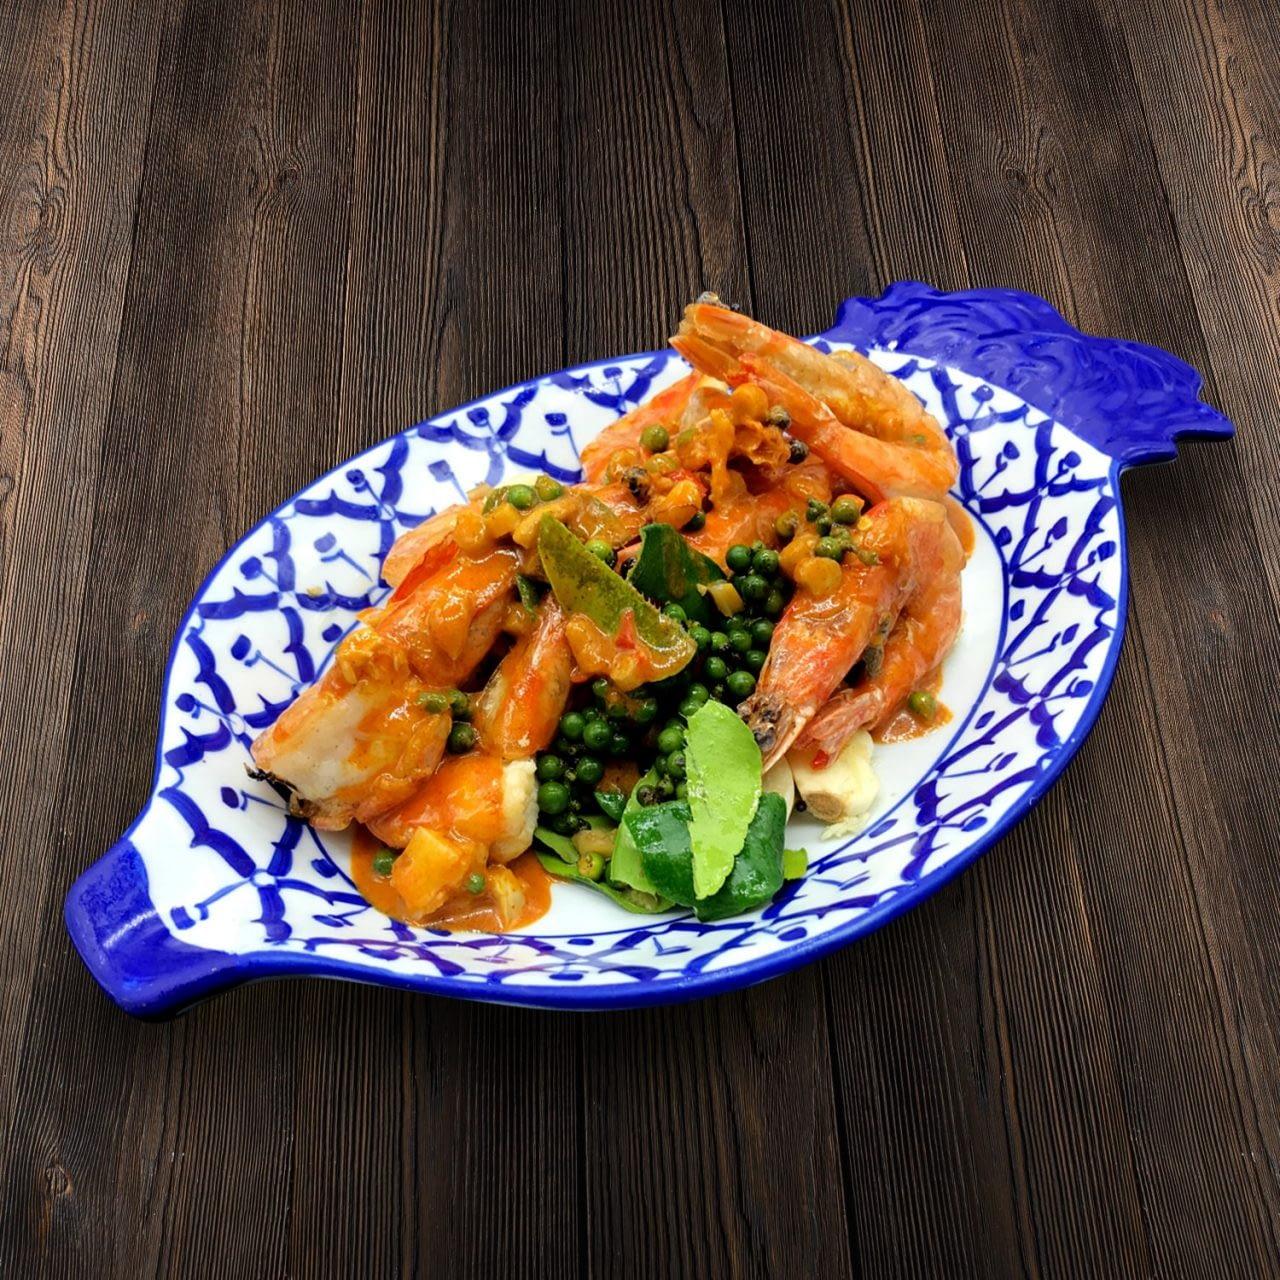 Thai Food Delivery Kuala Lumpur Stir Fried Prawn with Phrik Thai-min